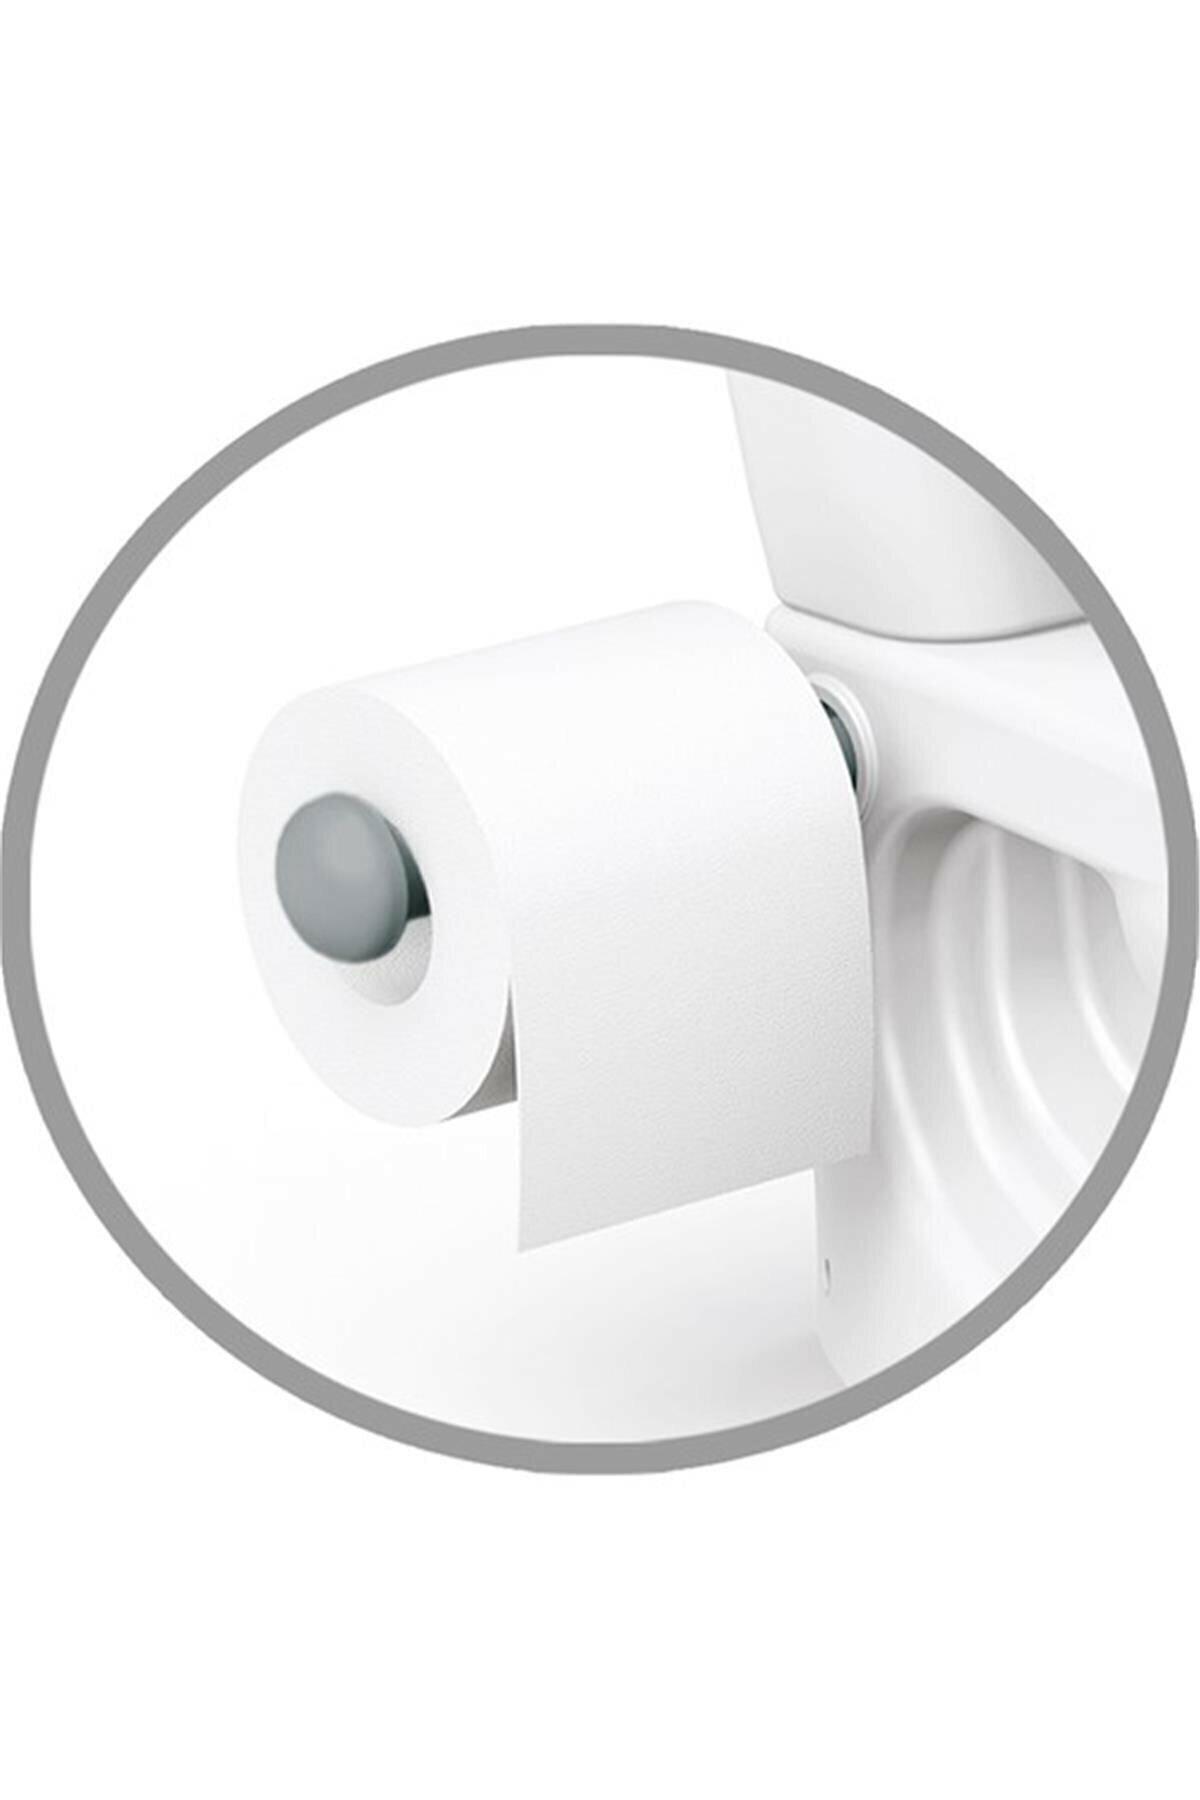 Baby Child Toilet Training Dog Printed Educational Toilet Seat Toilet Paper Holder 25 Kg Loading Capacity enlarge